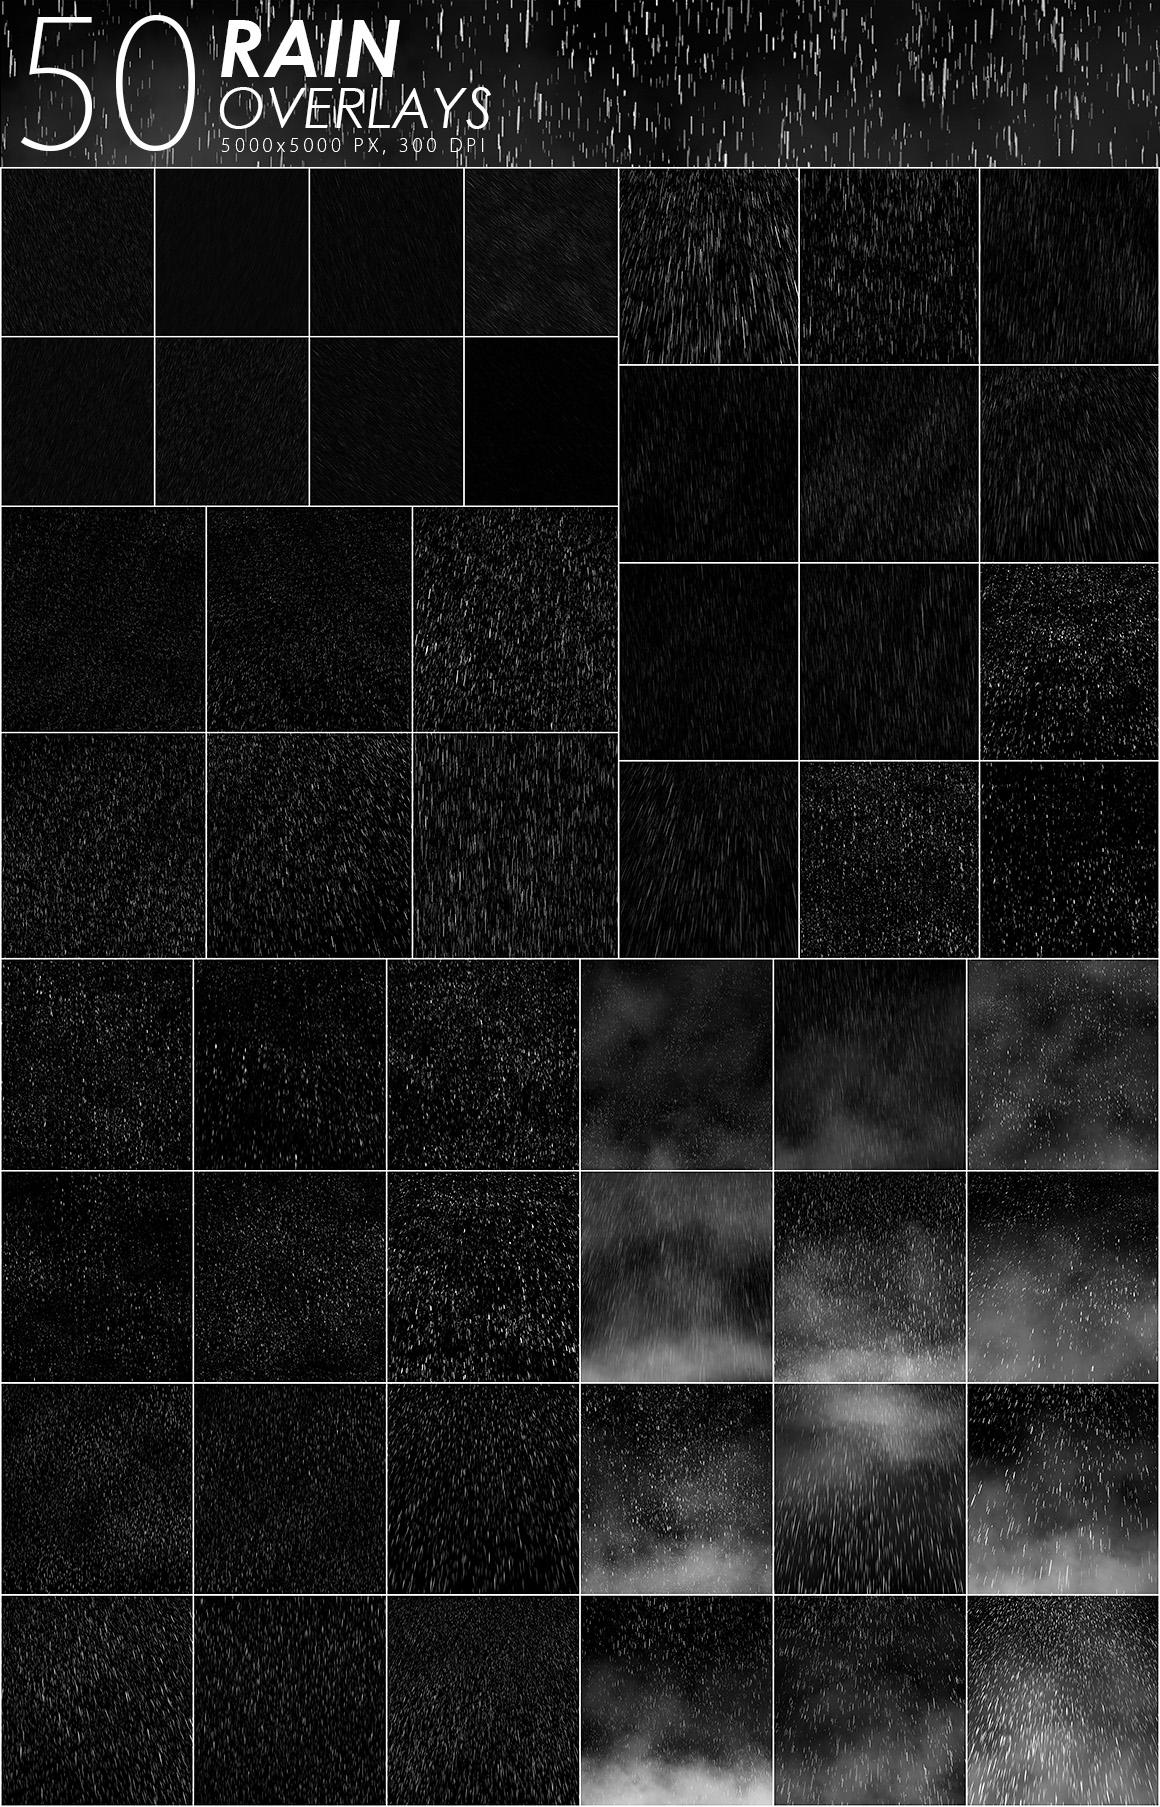 525 Rain, Snow, Lightning Overlays example image 3